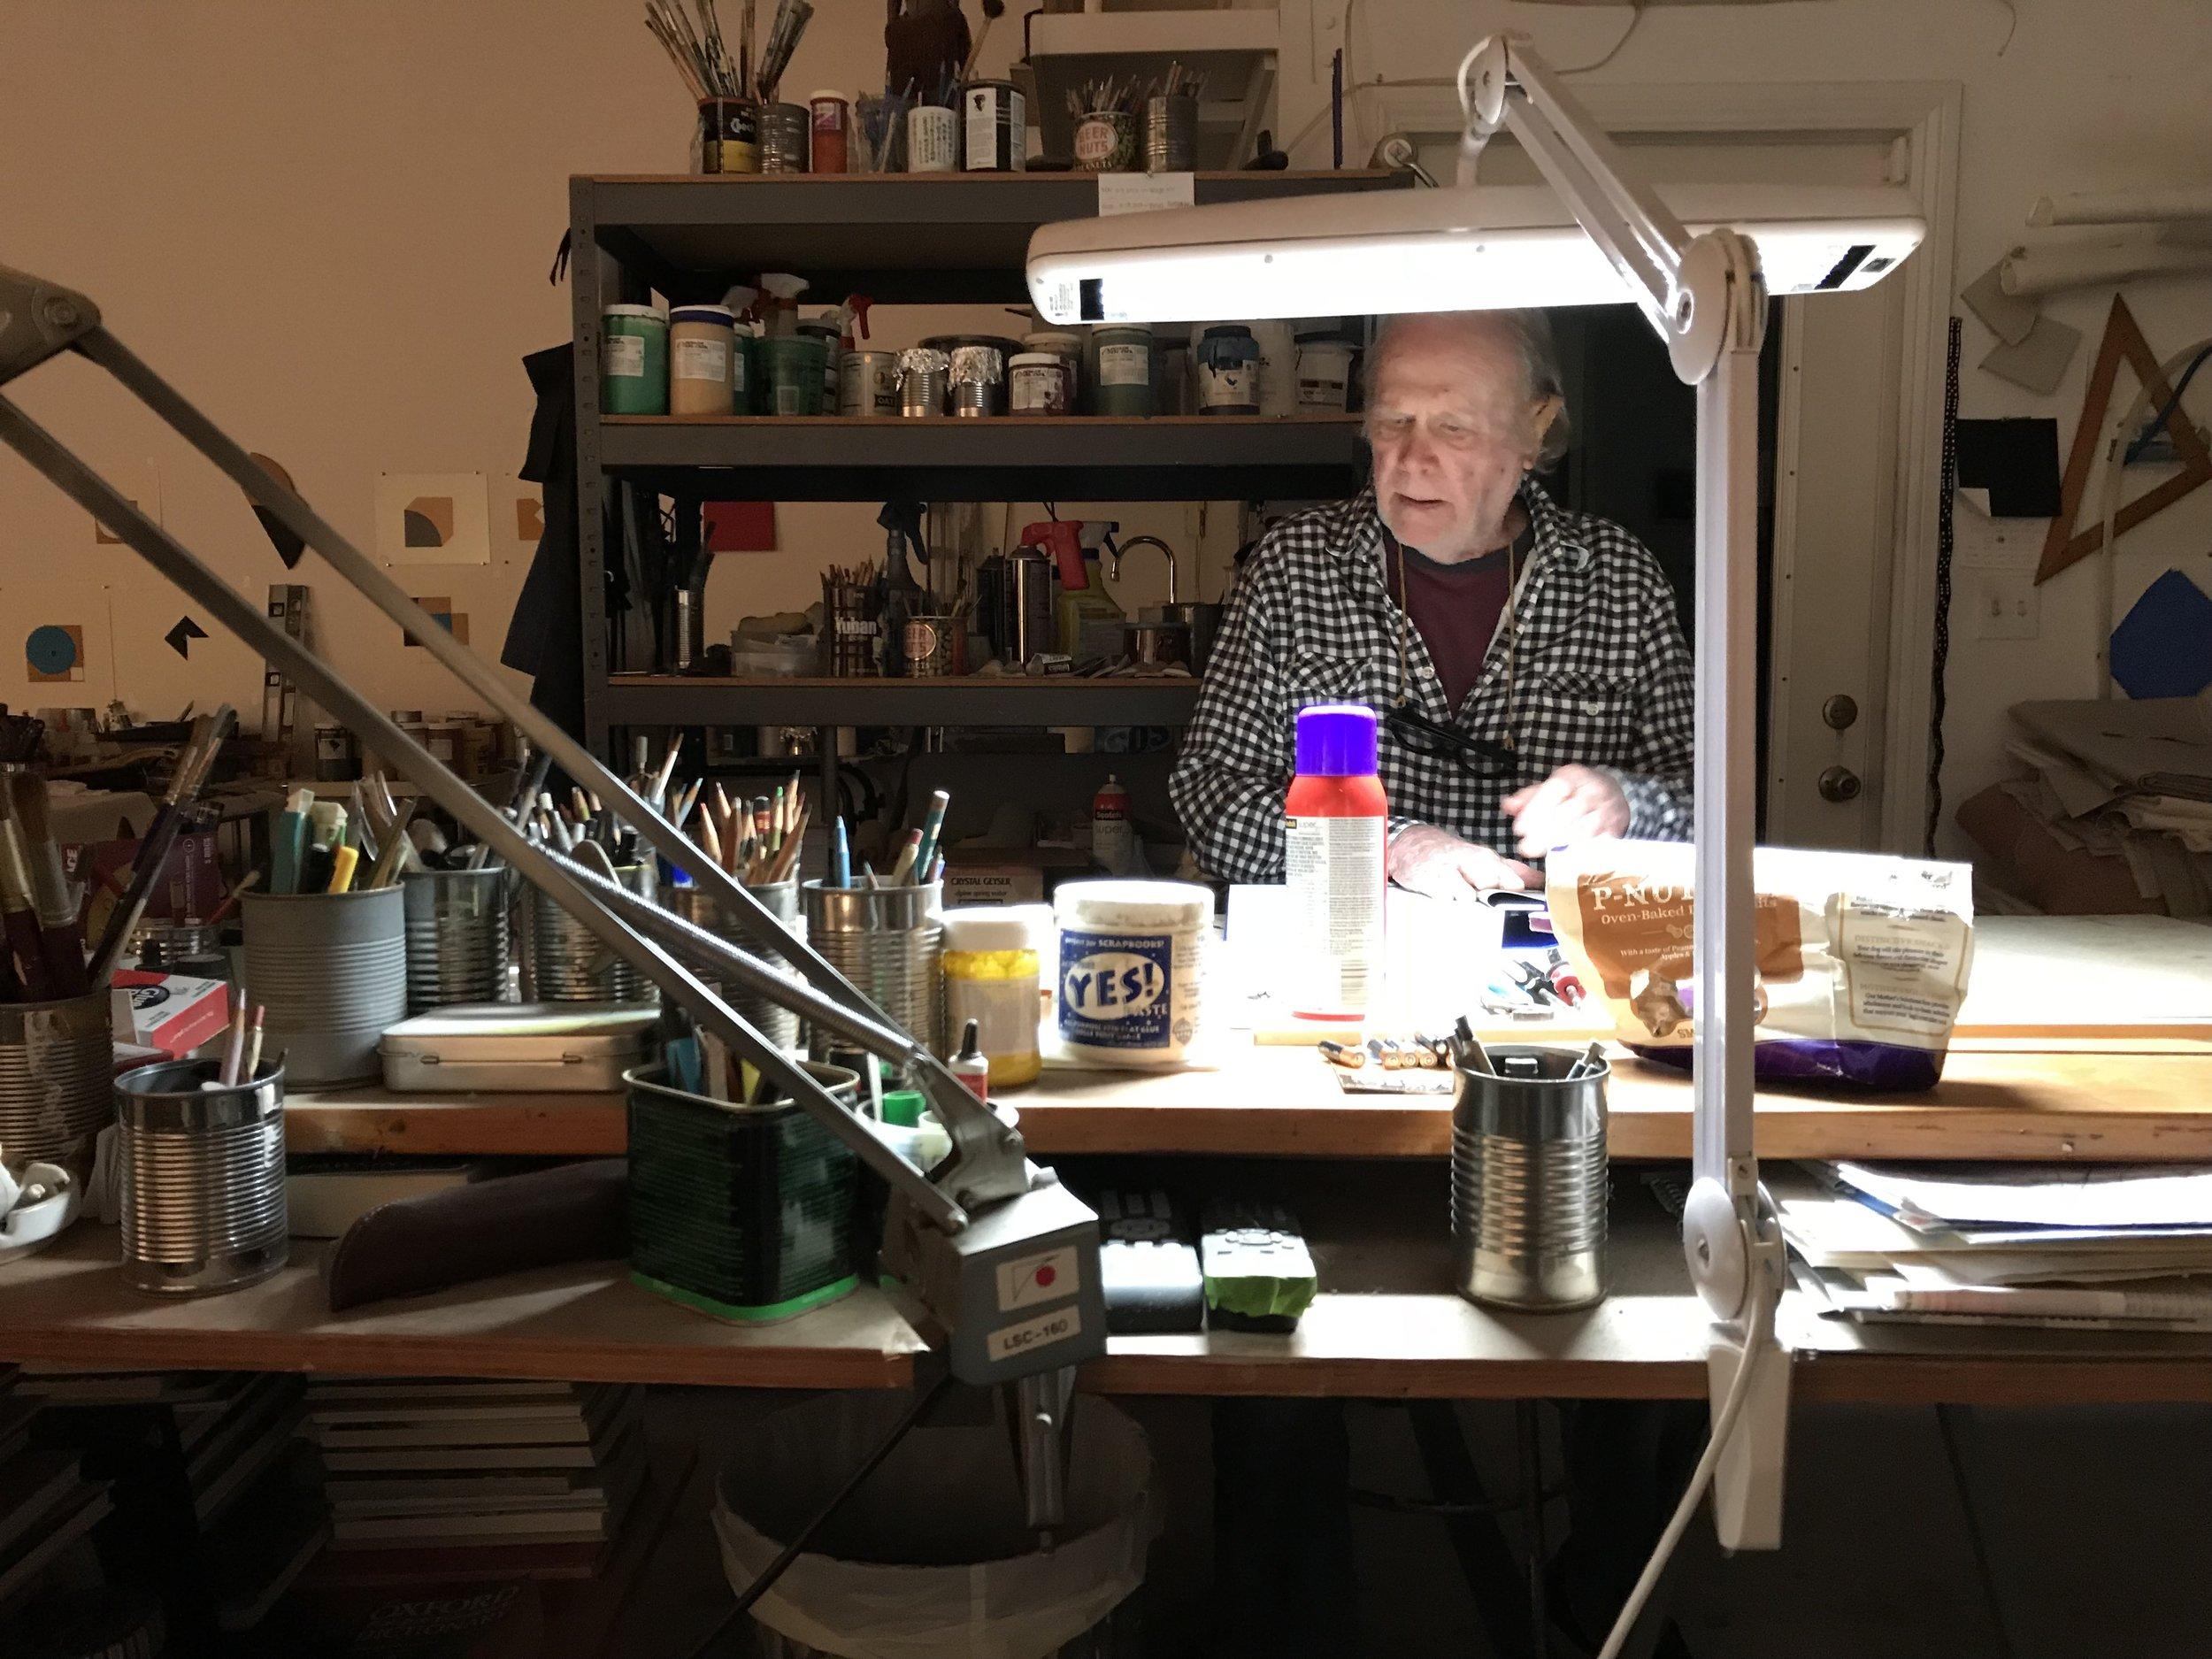 Tony DeLap in studio; courtesy of Parrasch Heijnen Gallery